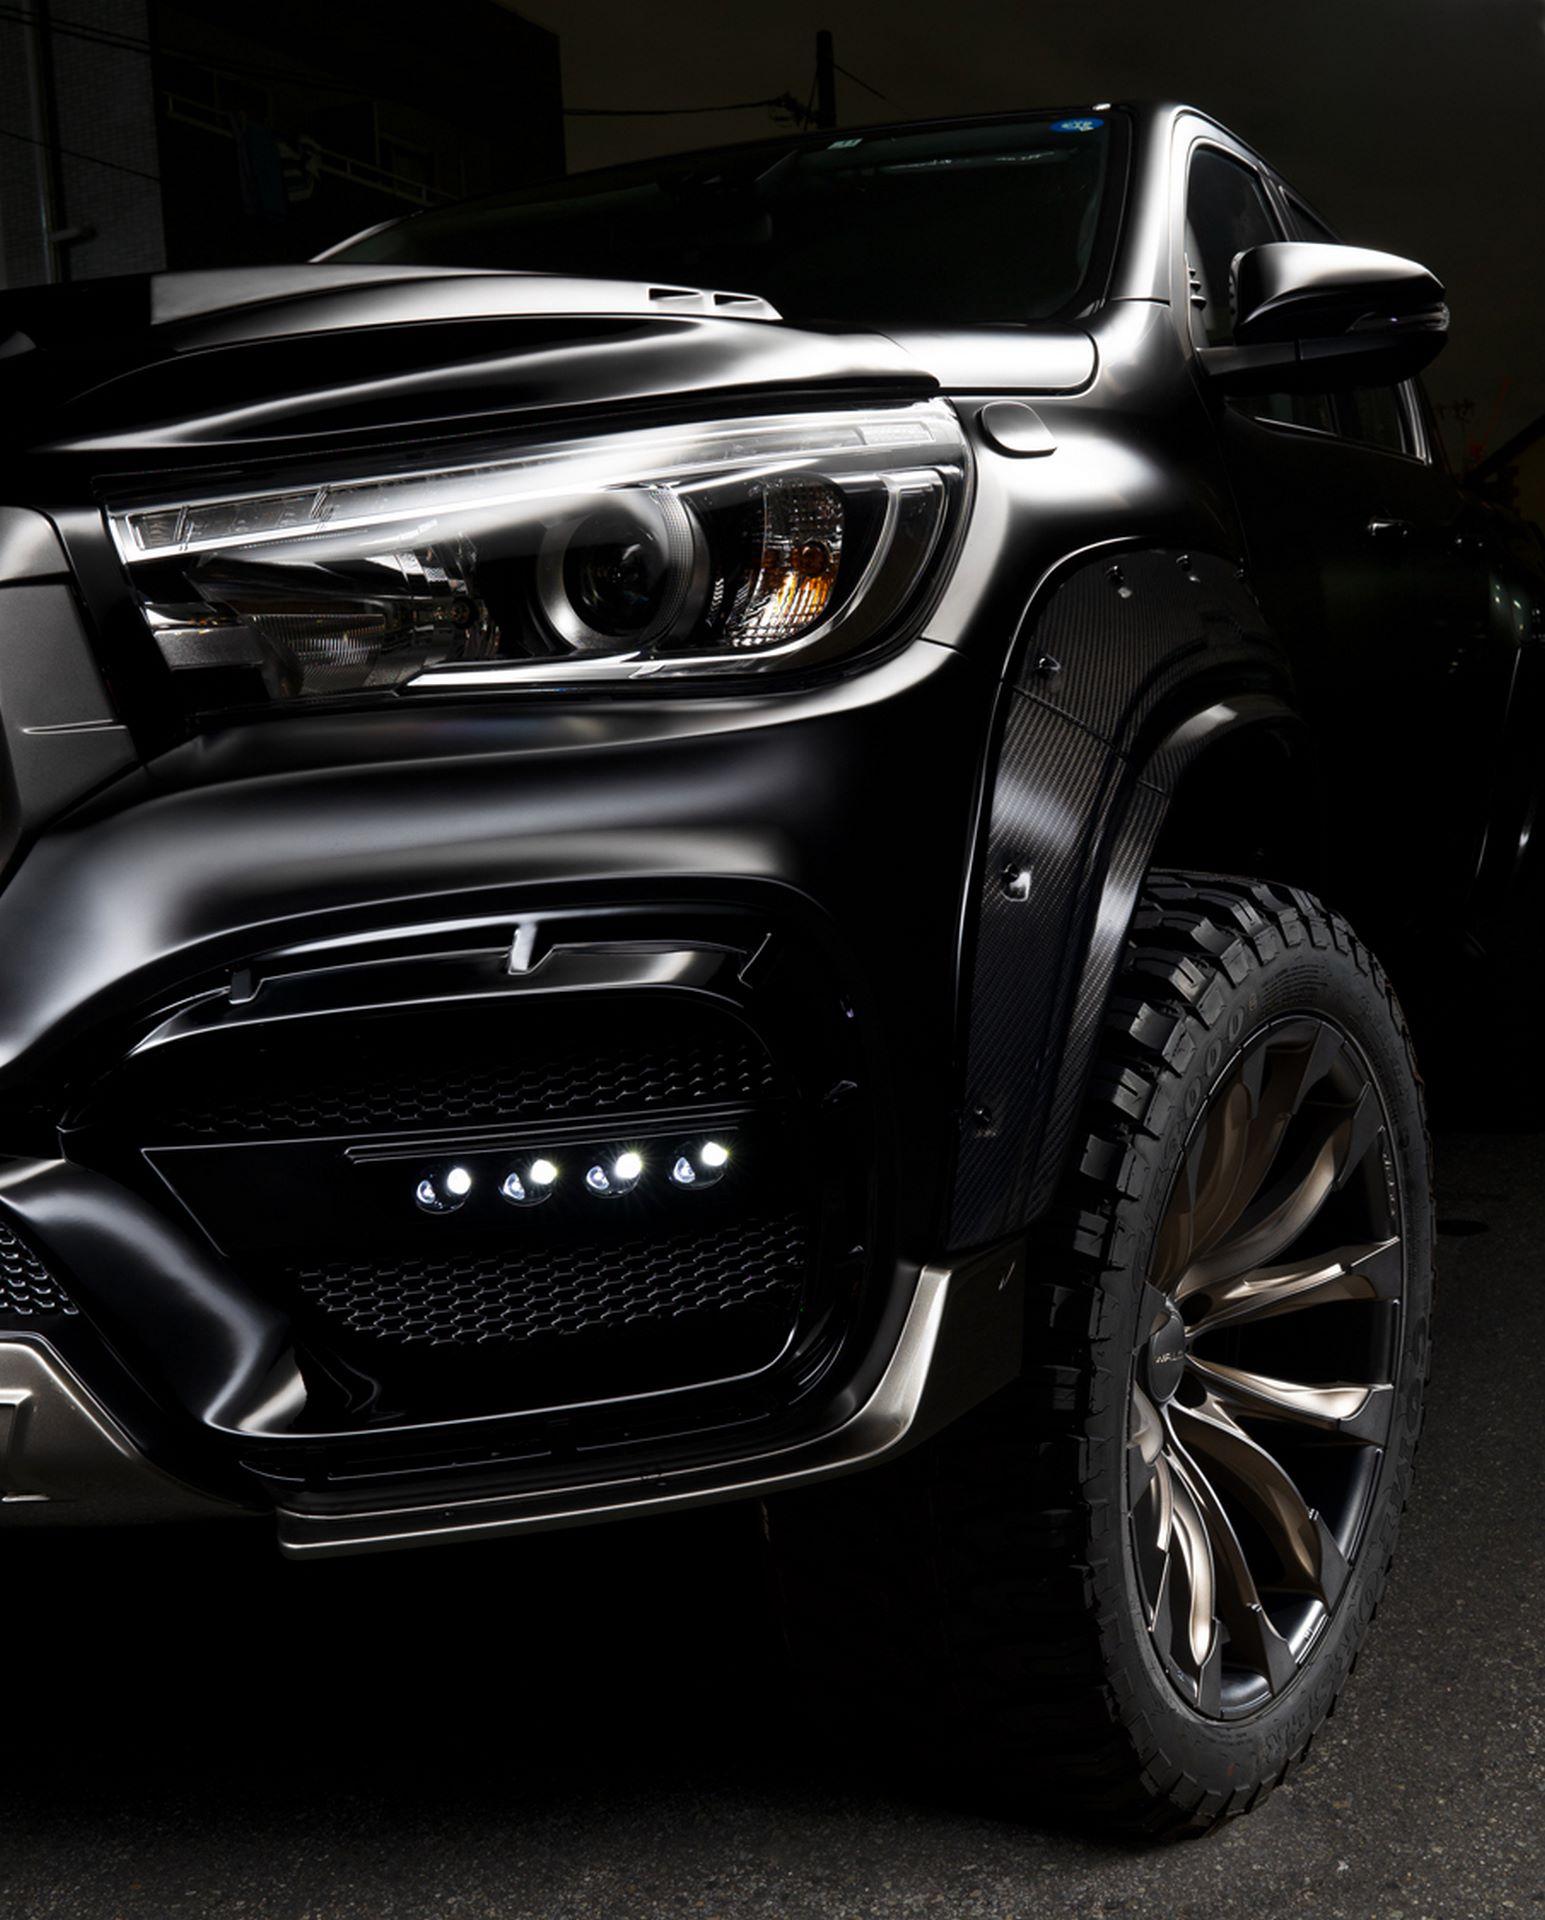 Toyota-Hilux-Black-Bison-by-Wald-International-5